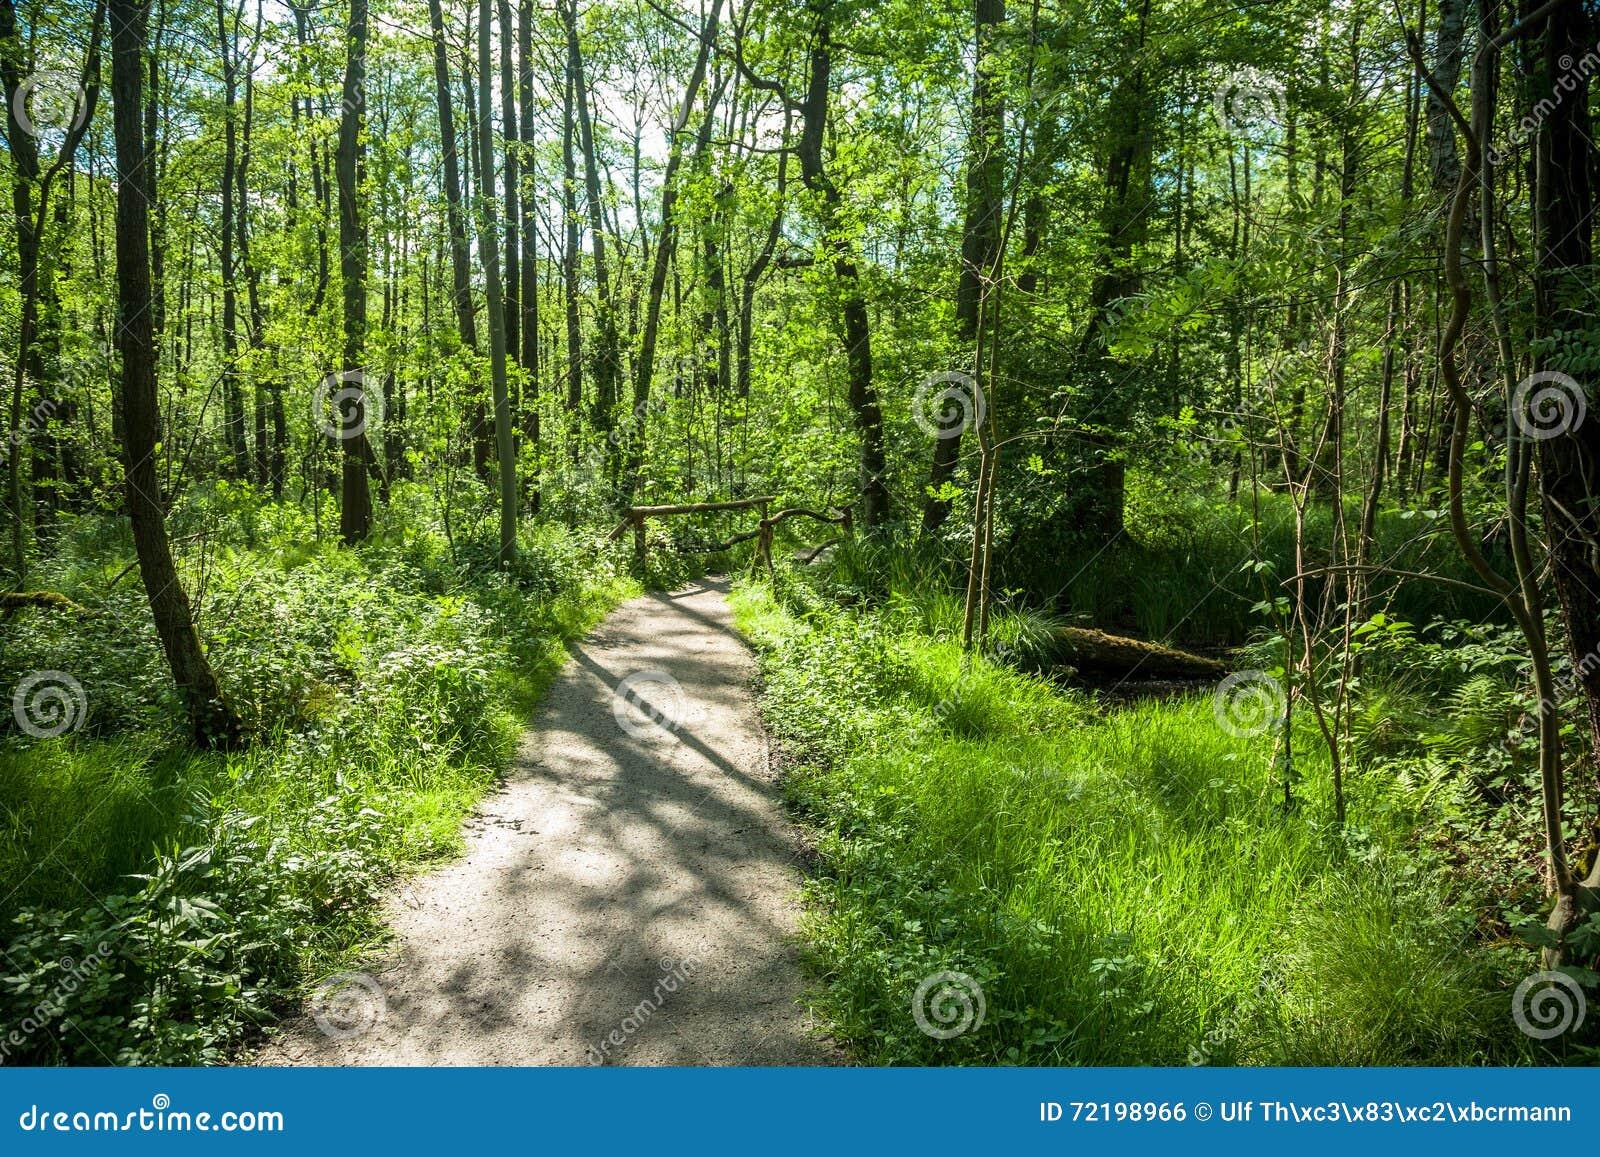 Forest Trees Park Footpath Springtime